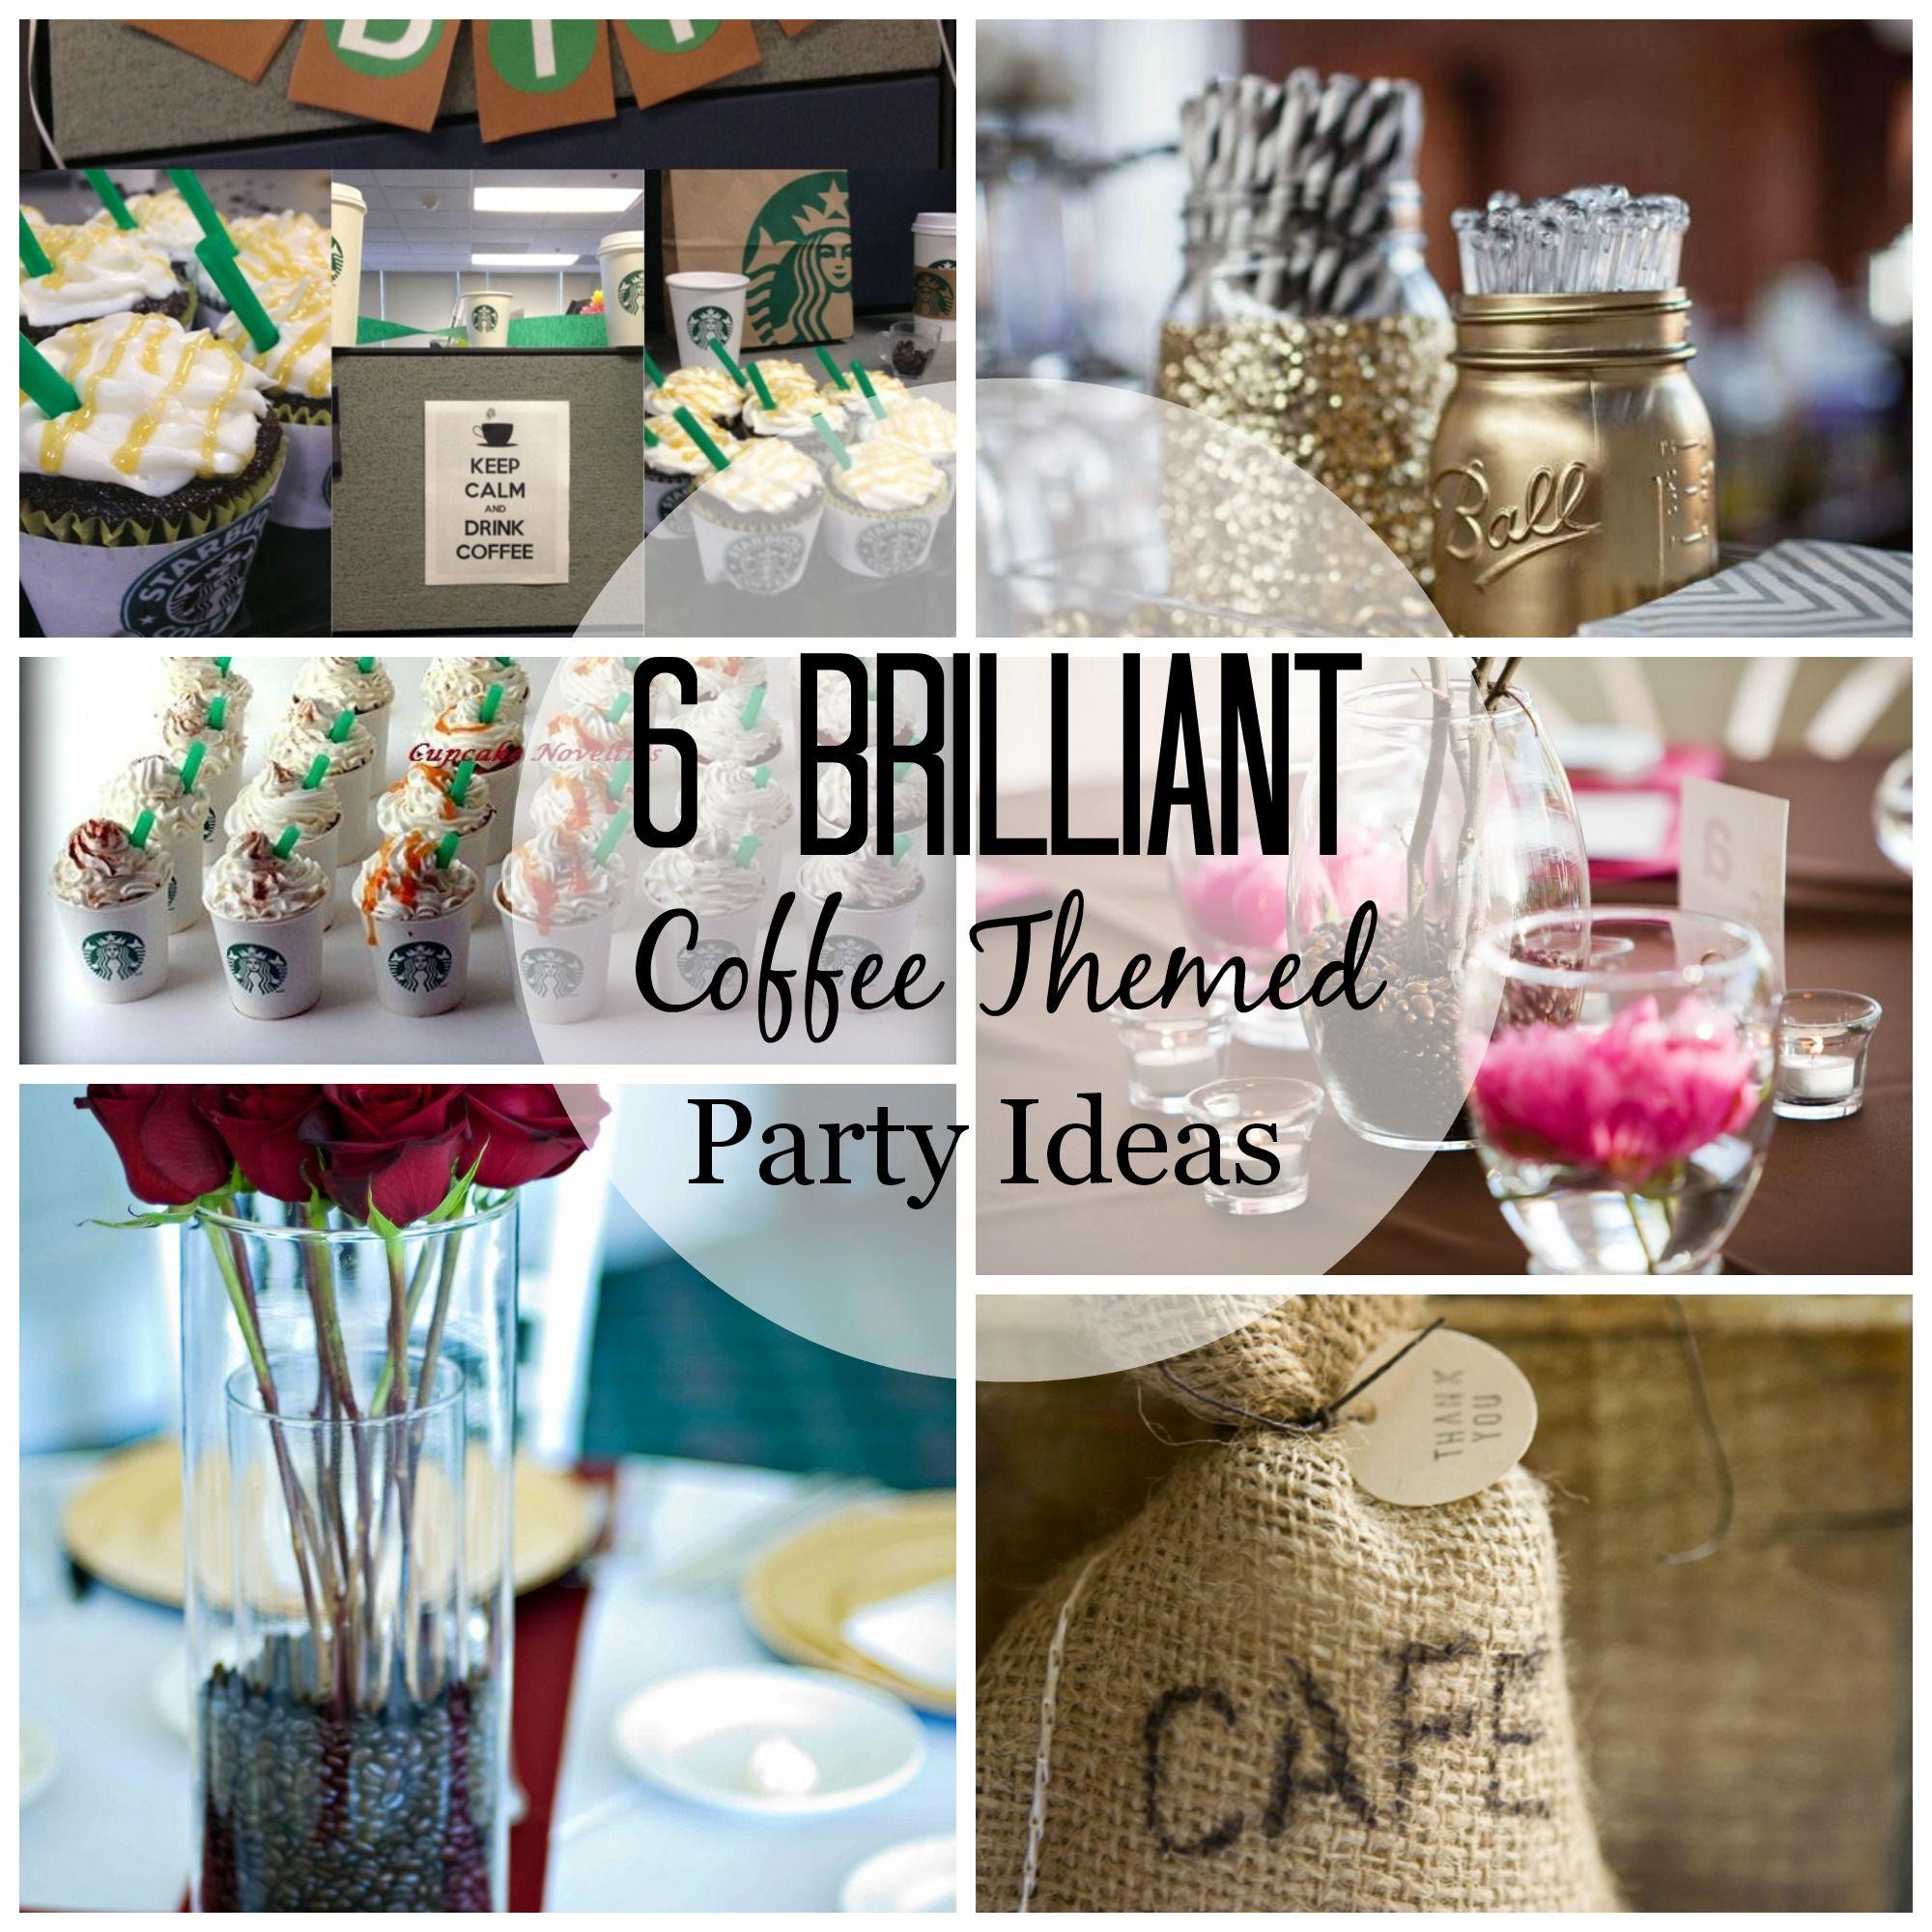 Diy Coffee Bar Ideas For A Fabulous Brunch Party Coffee Bar Party Diy Coffee Bar Coffee Bar